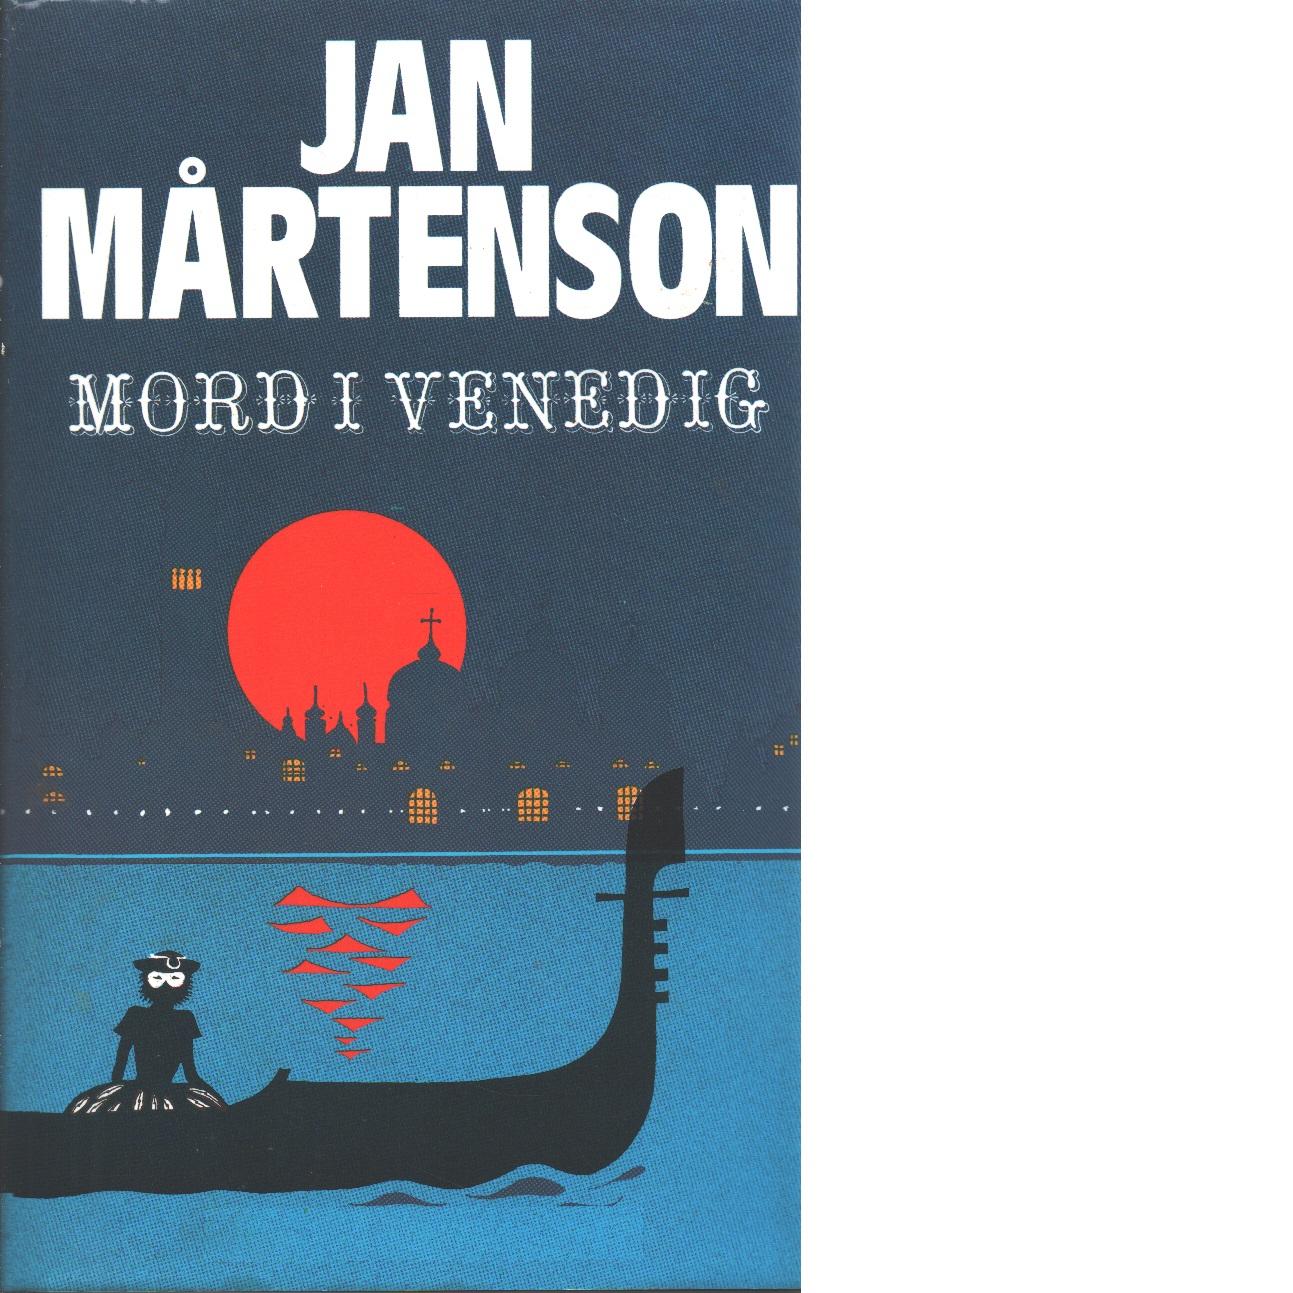 Mord i Venedig - Mårtenson, Jan